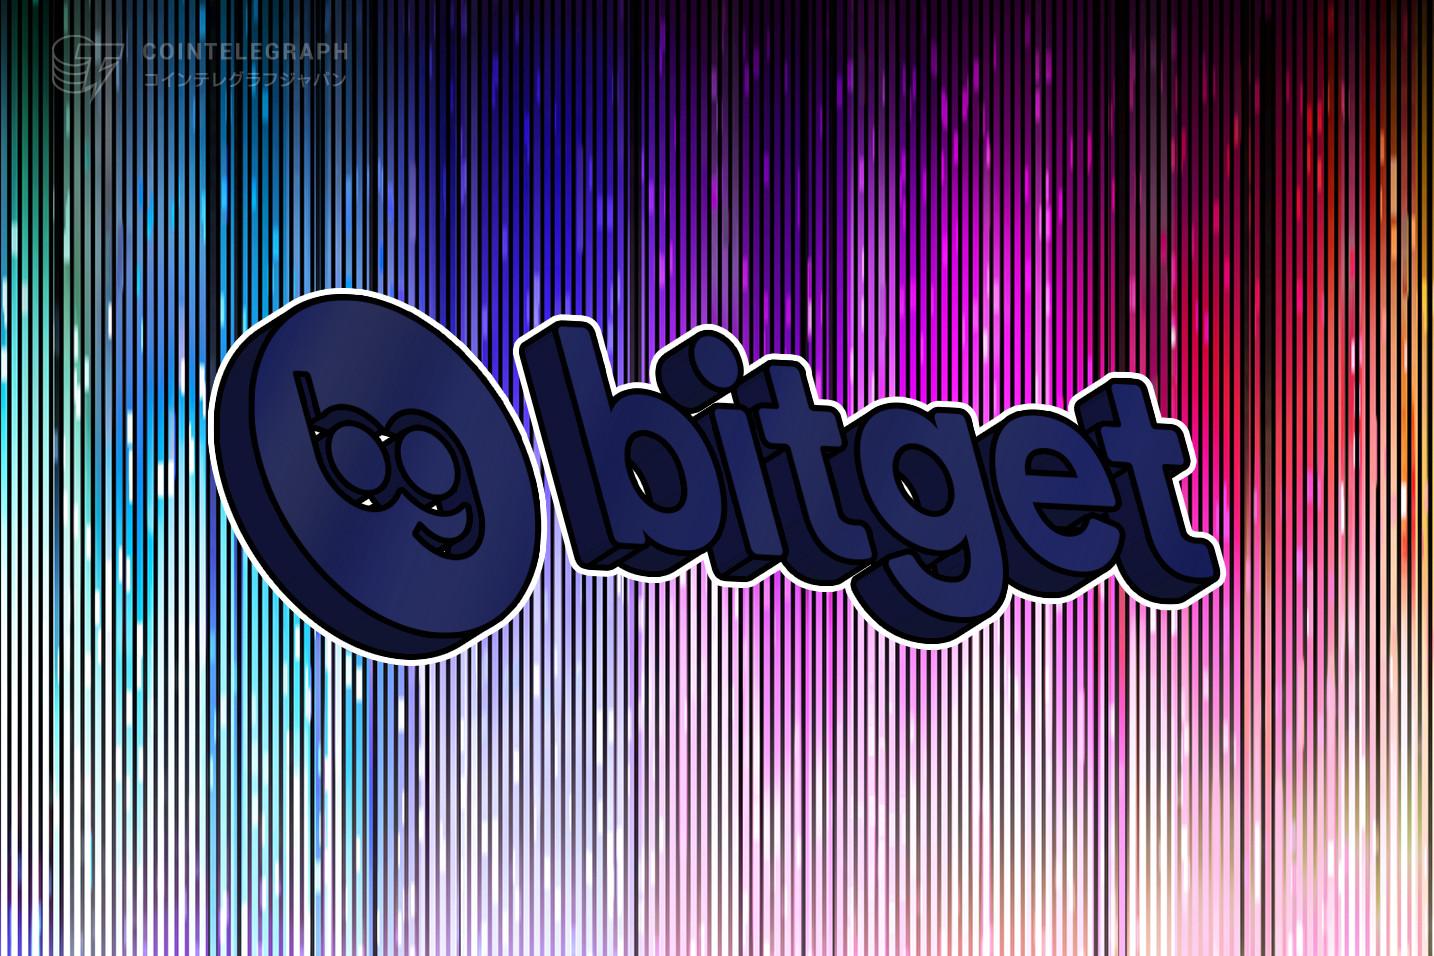 Bitgetが新しいスローガンーBetter Trading Better Lifeを起用